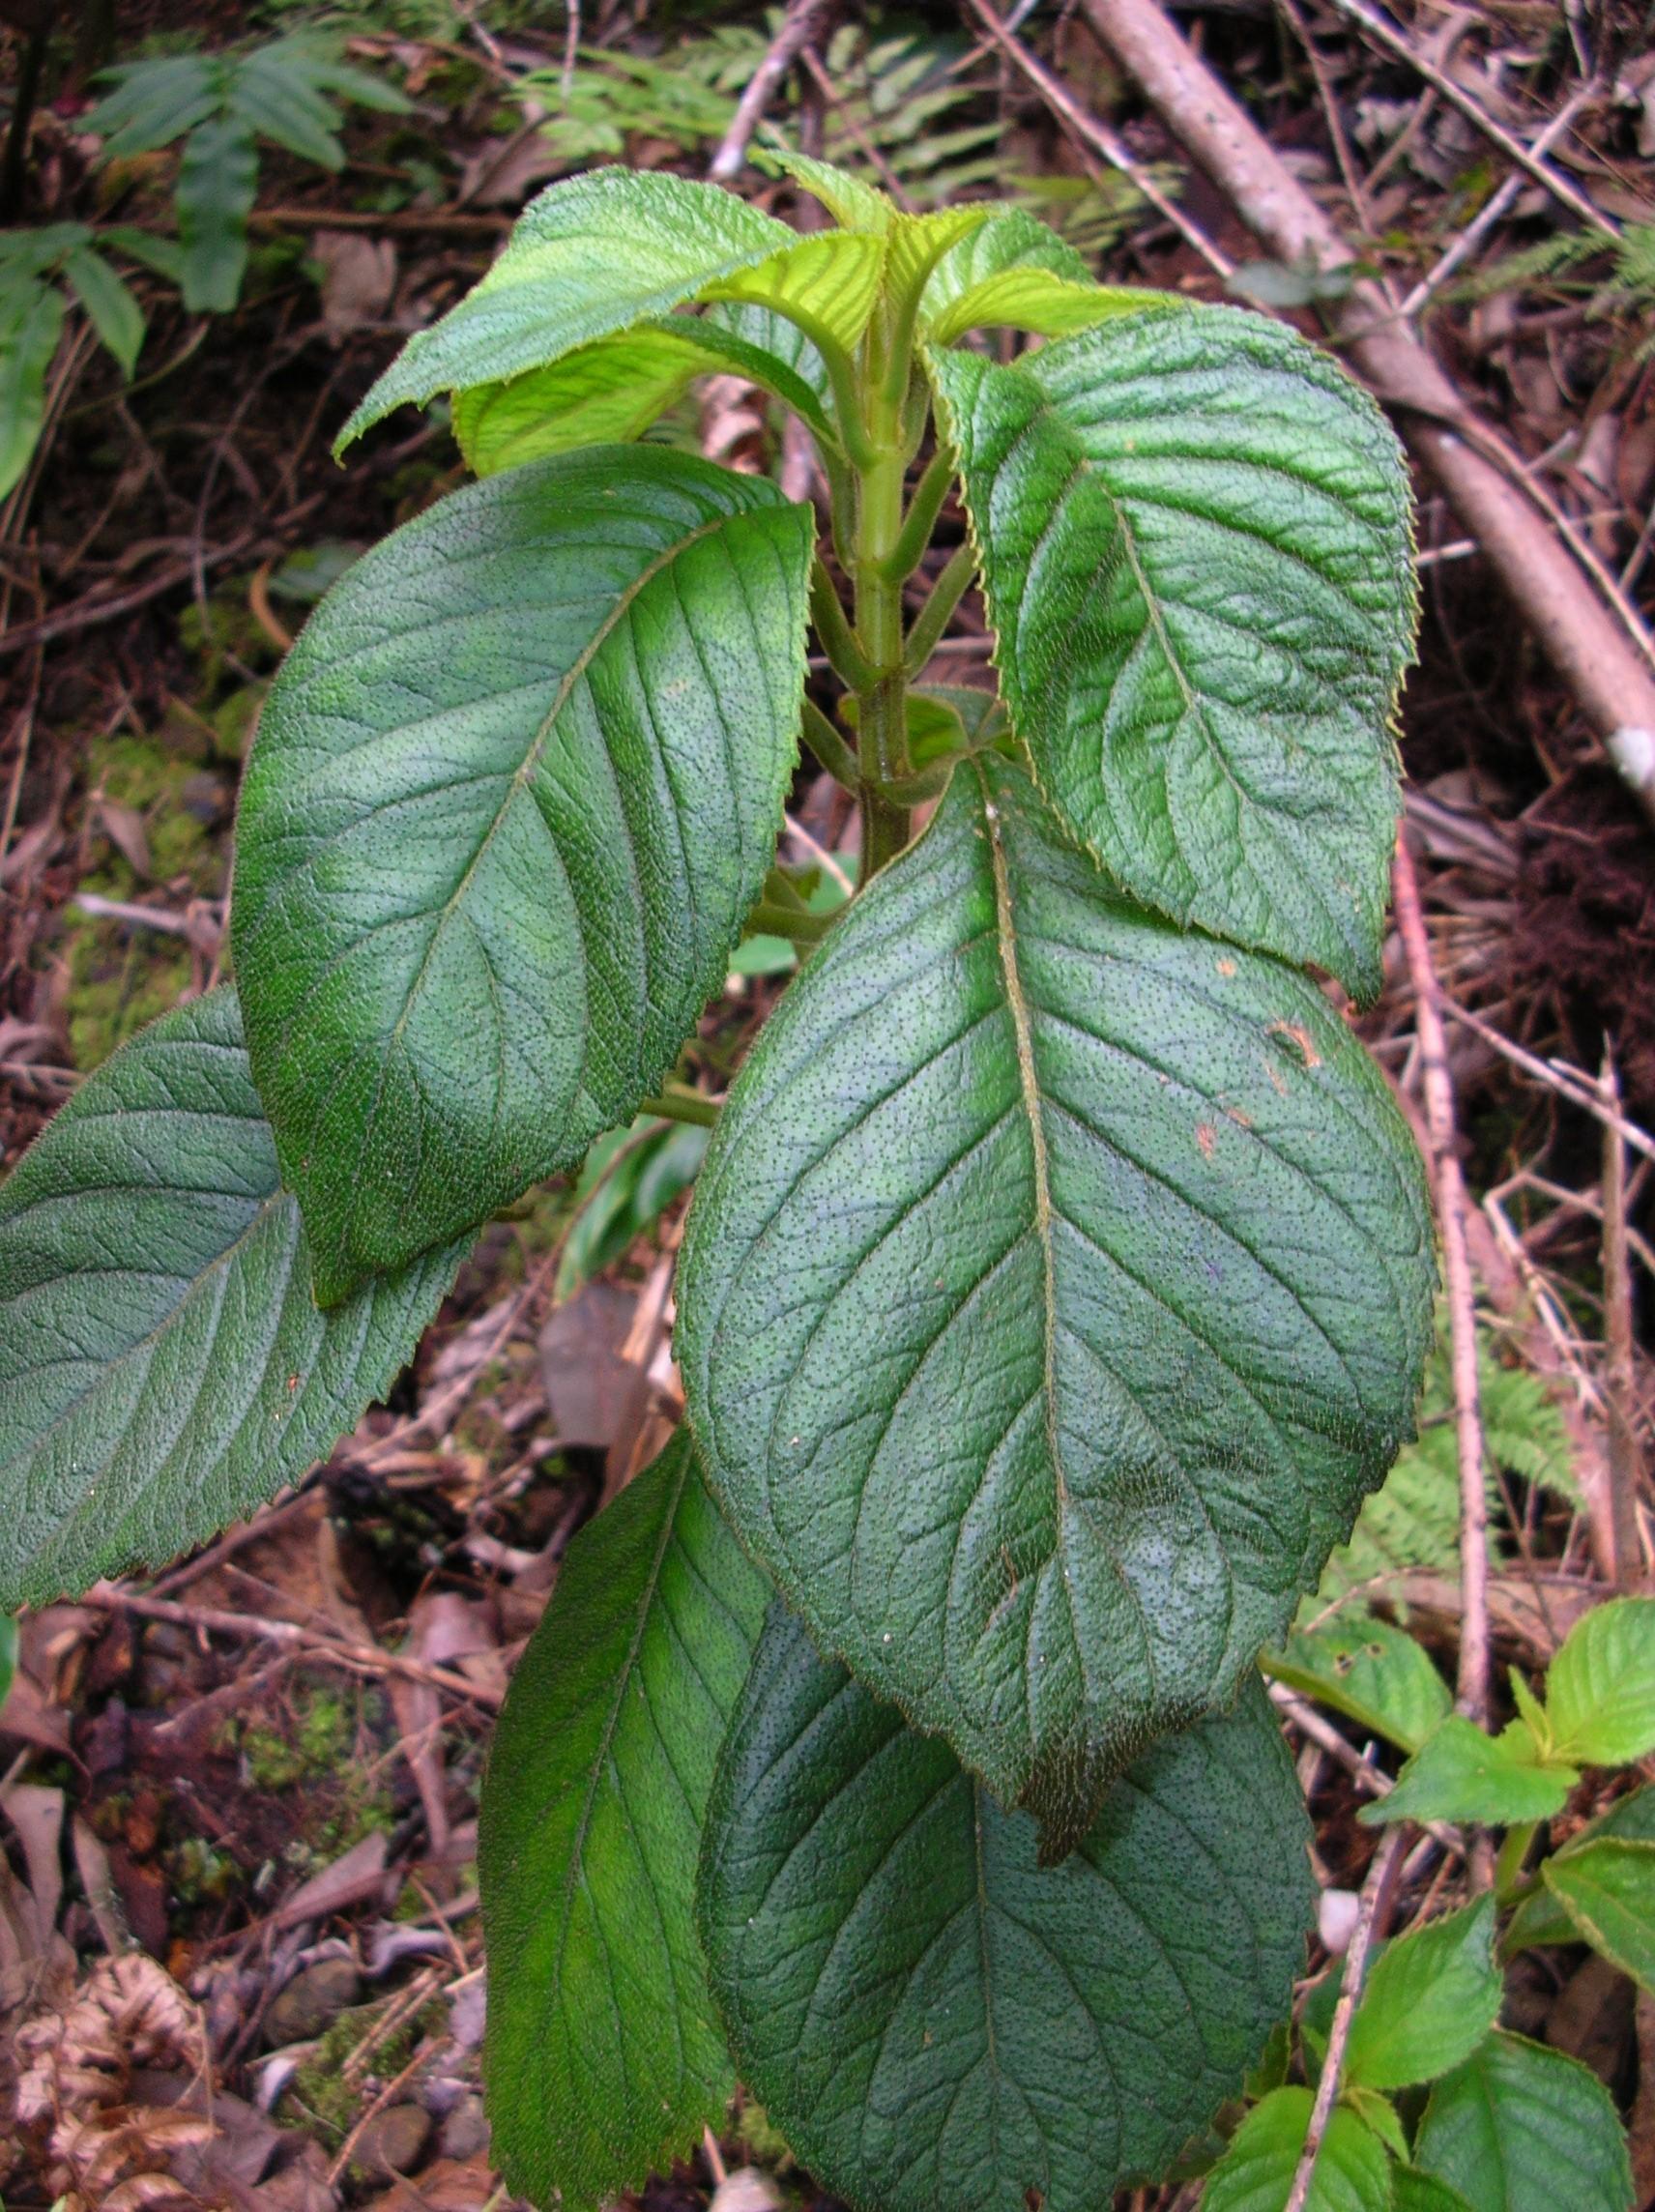 cyrtandra oenobarba